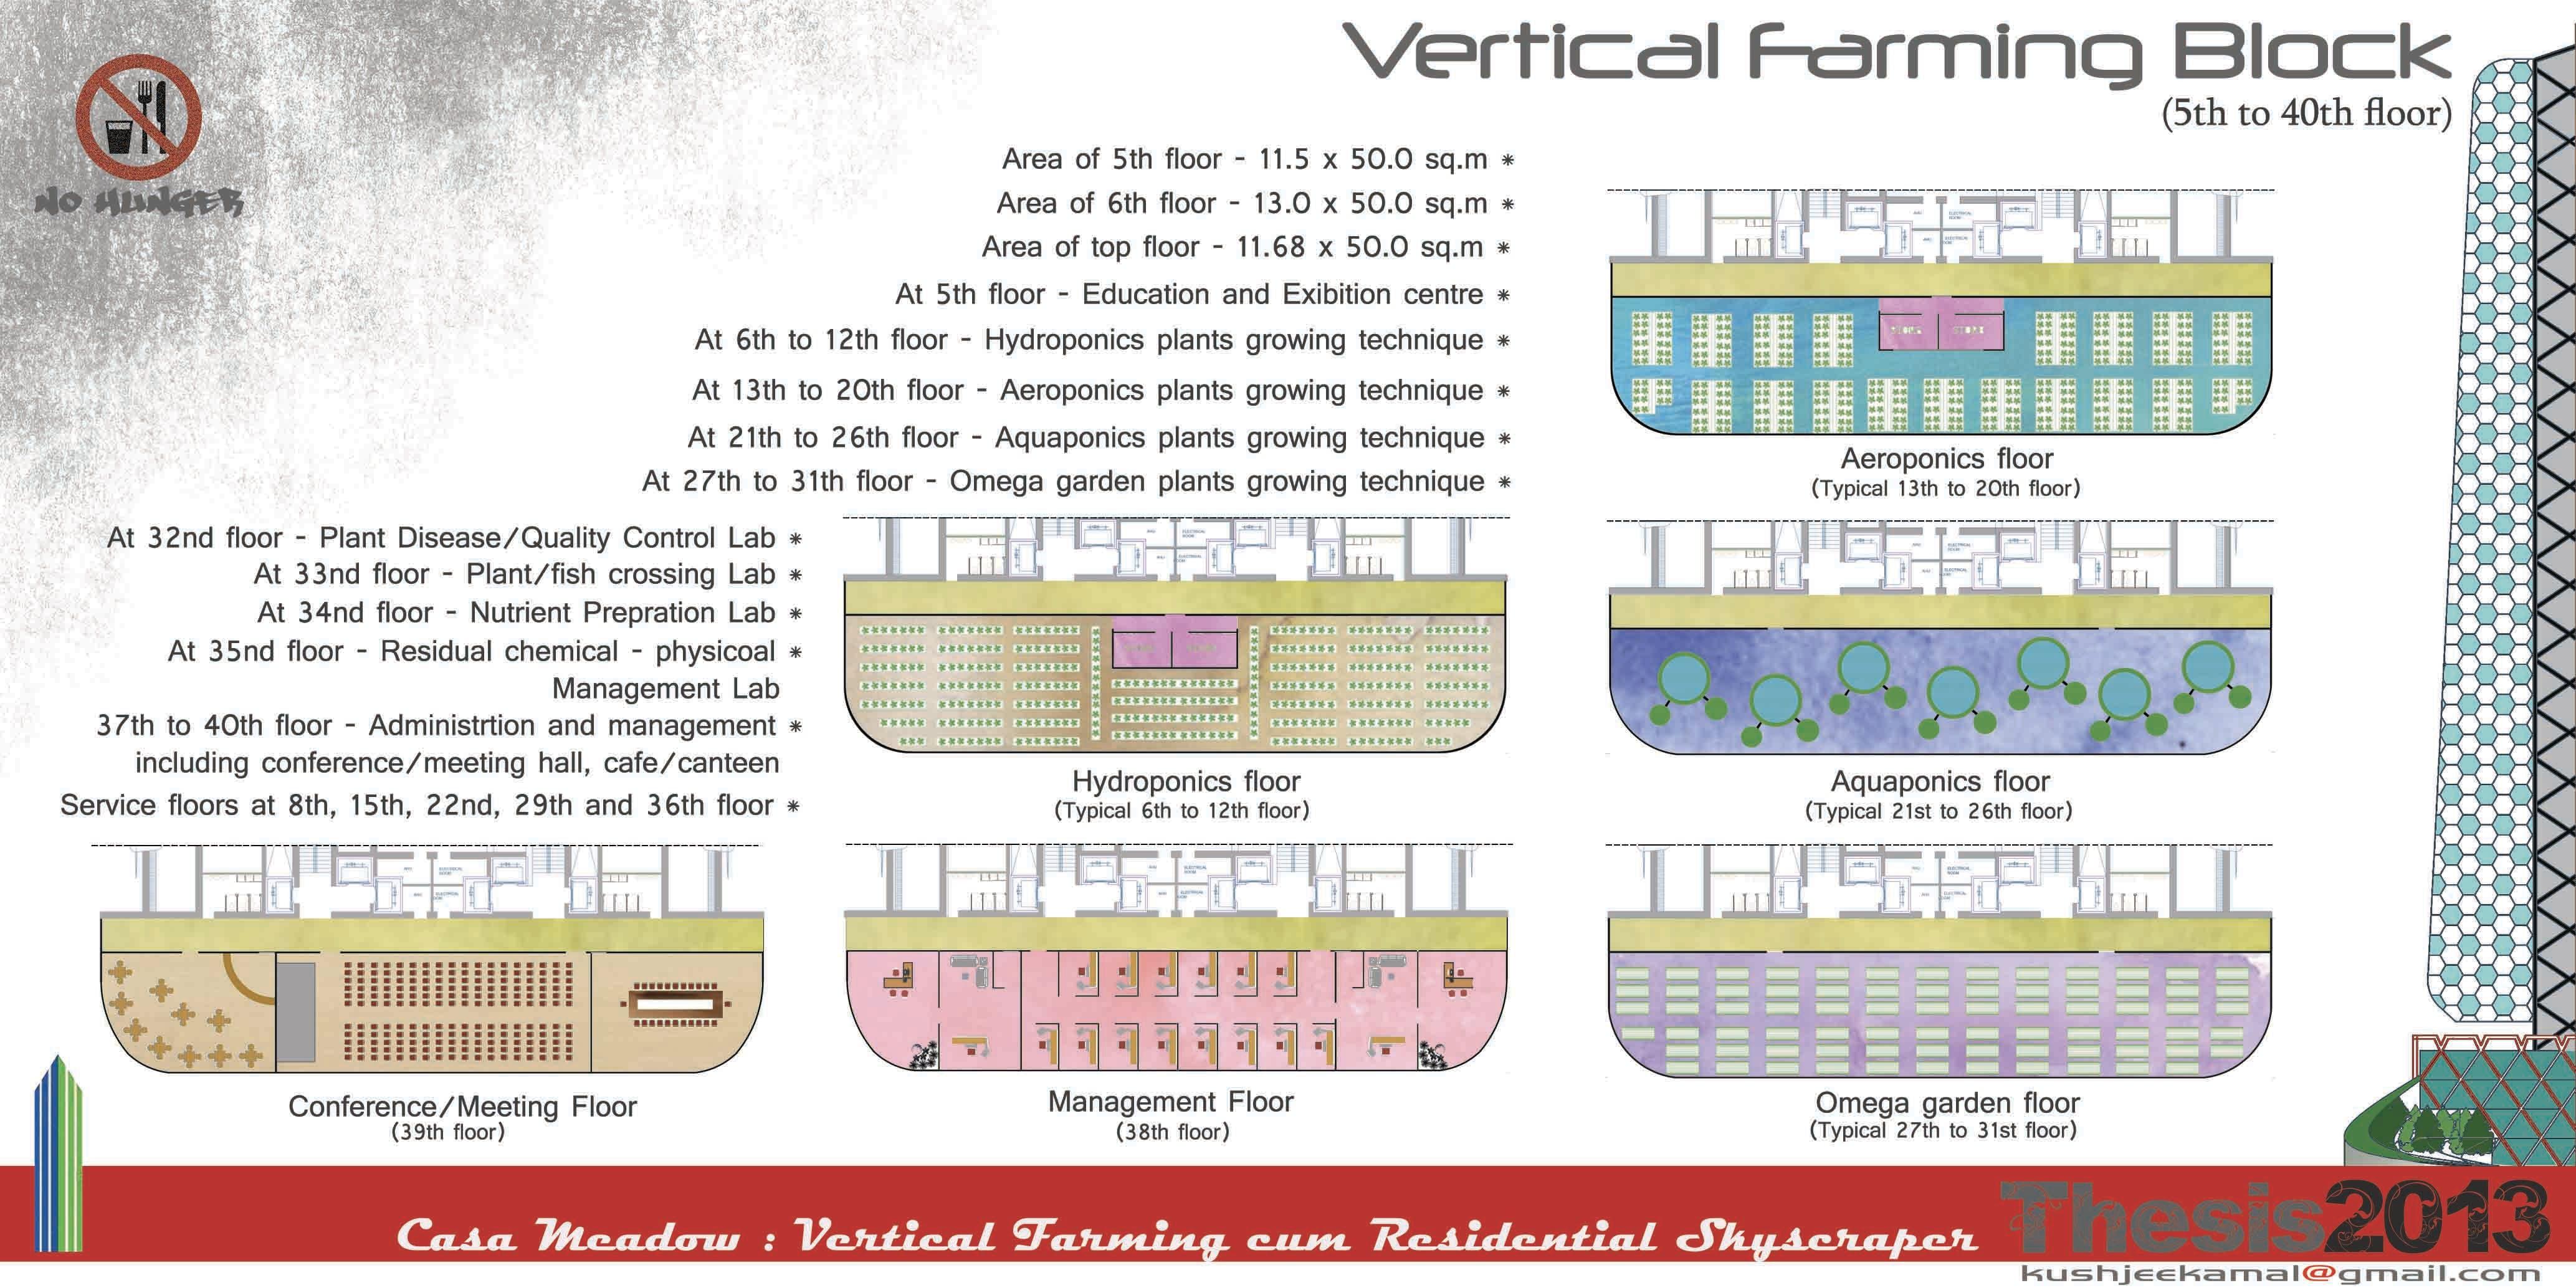 thesis   vertical farming cum residential skyscraper